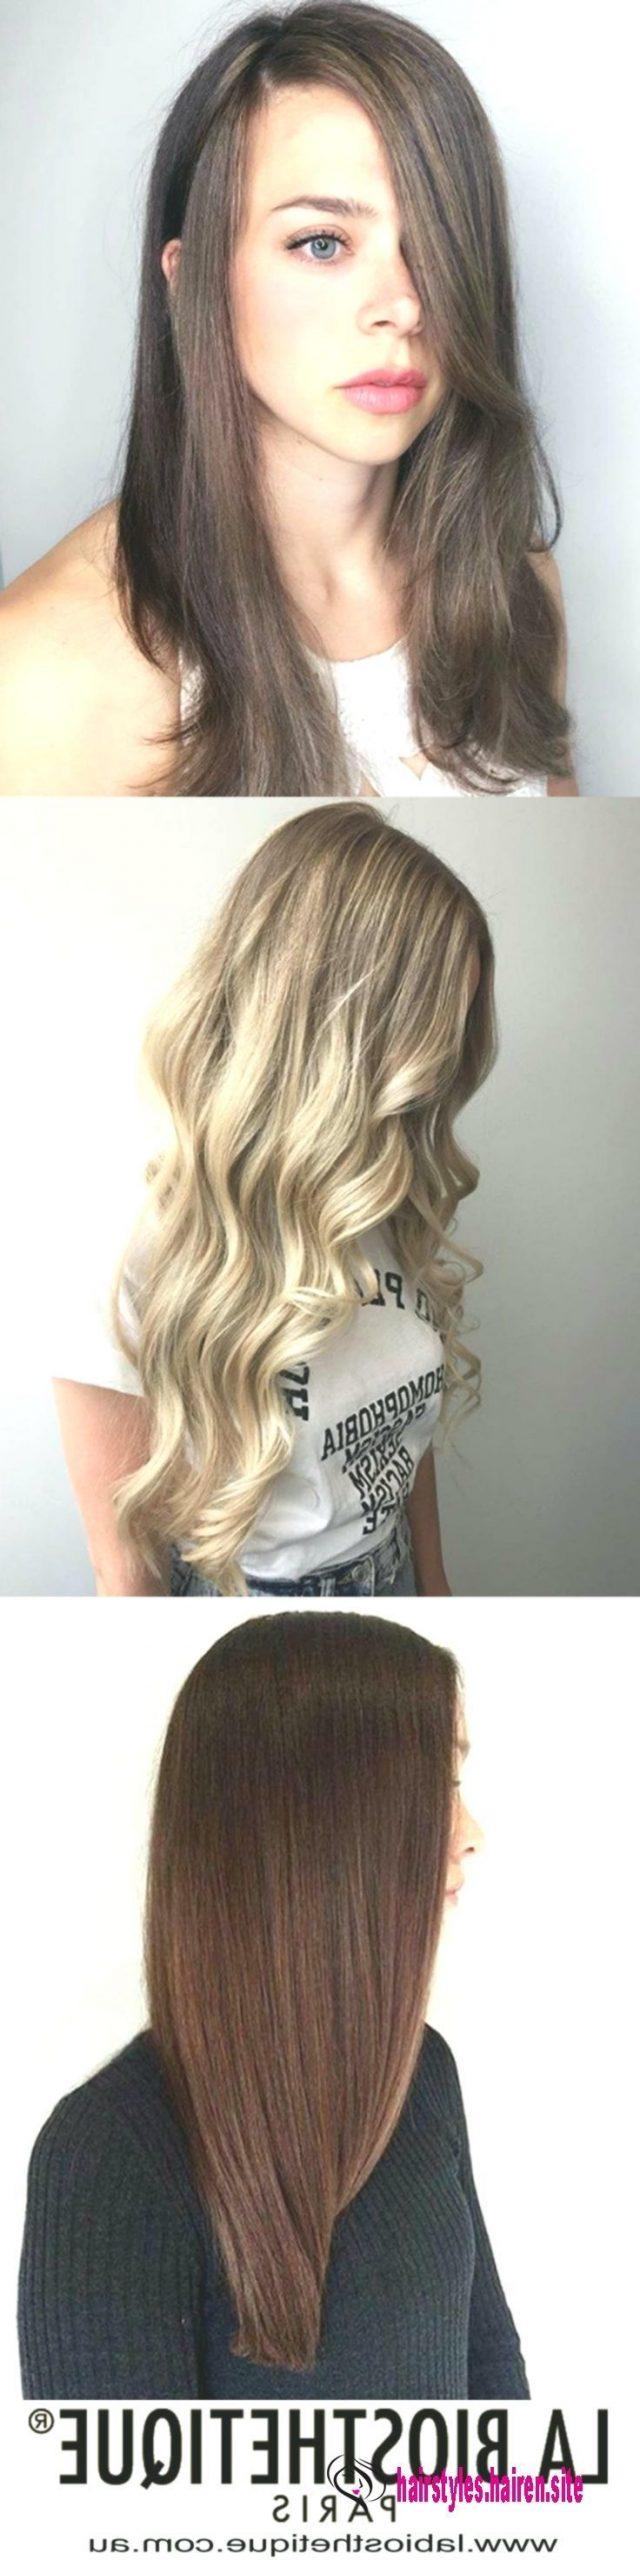 Nice hairstyles. Hairstyles │Short Hairstyles │Cute Girl Hairstyles │New ….